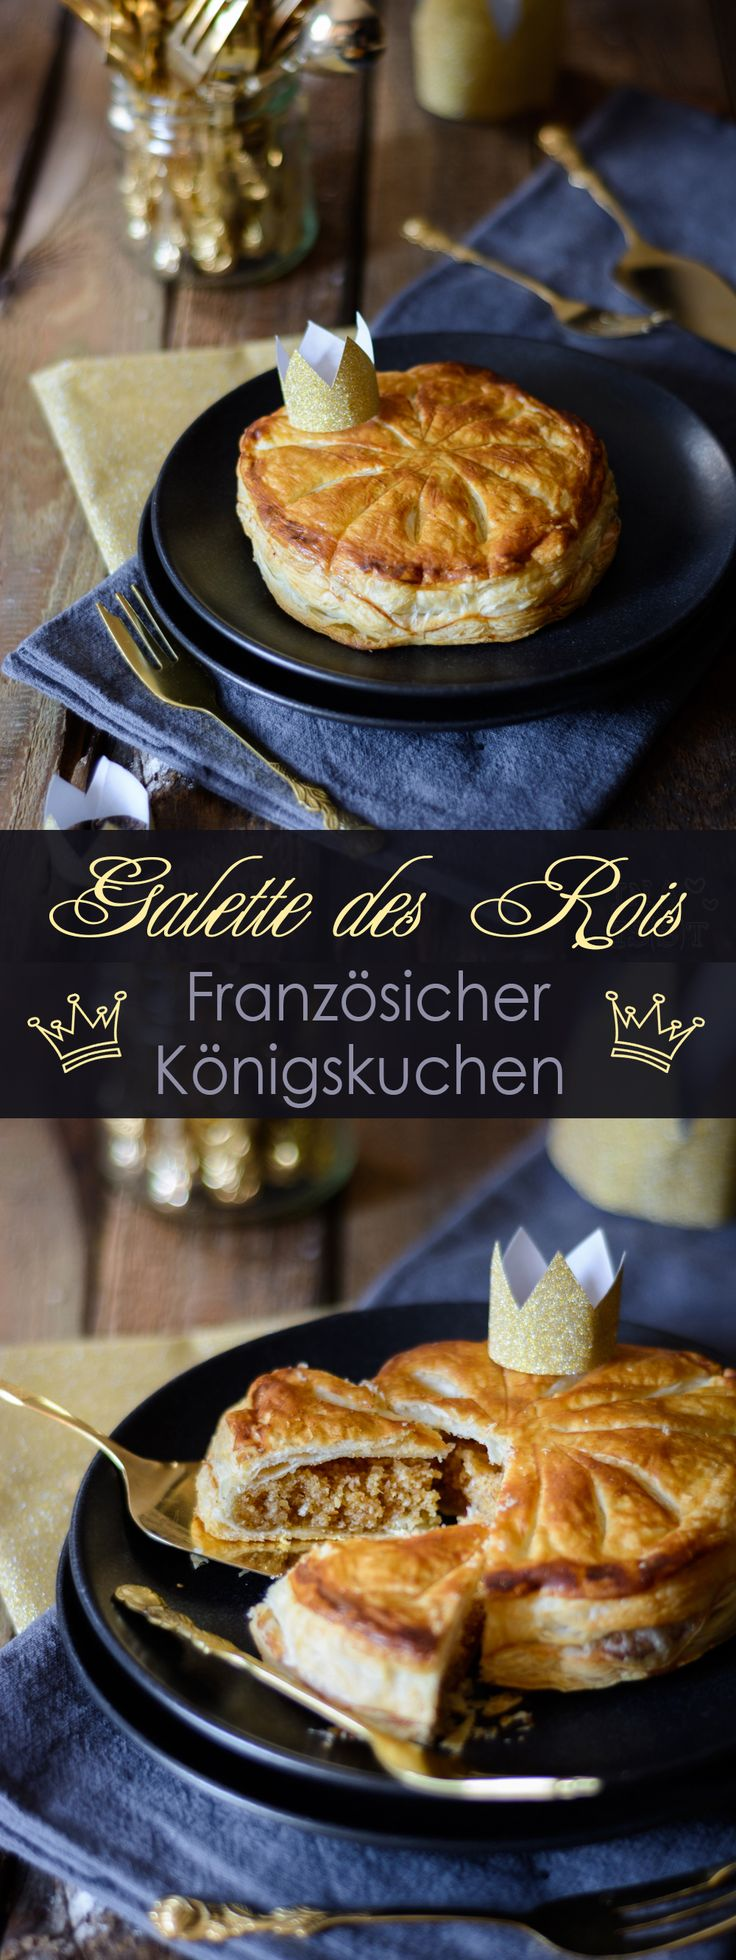 Emejing Internationale Küche Rezepte Pictures - Amazing Home Ideas ...